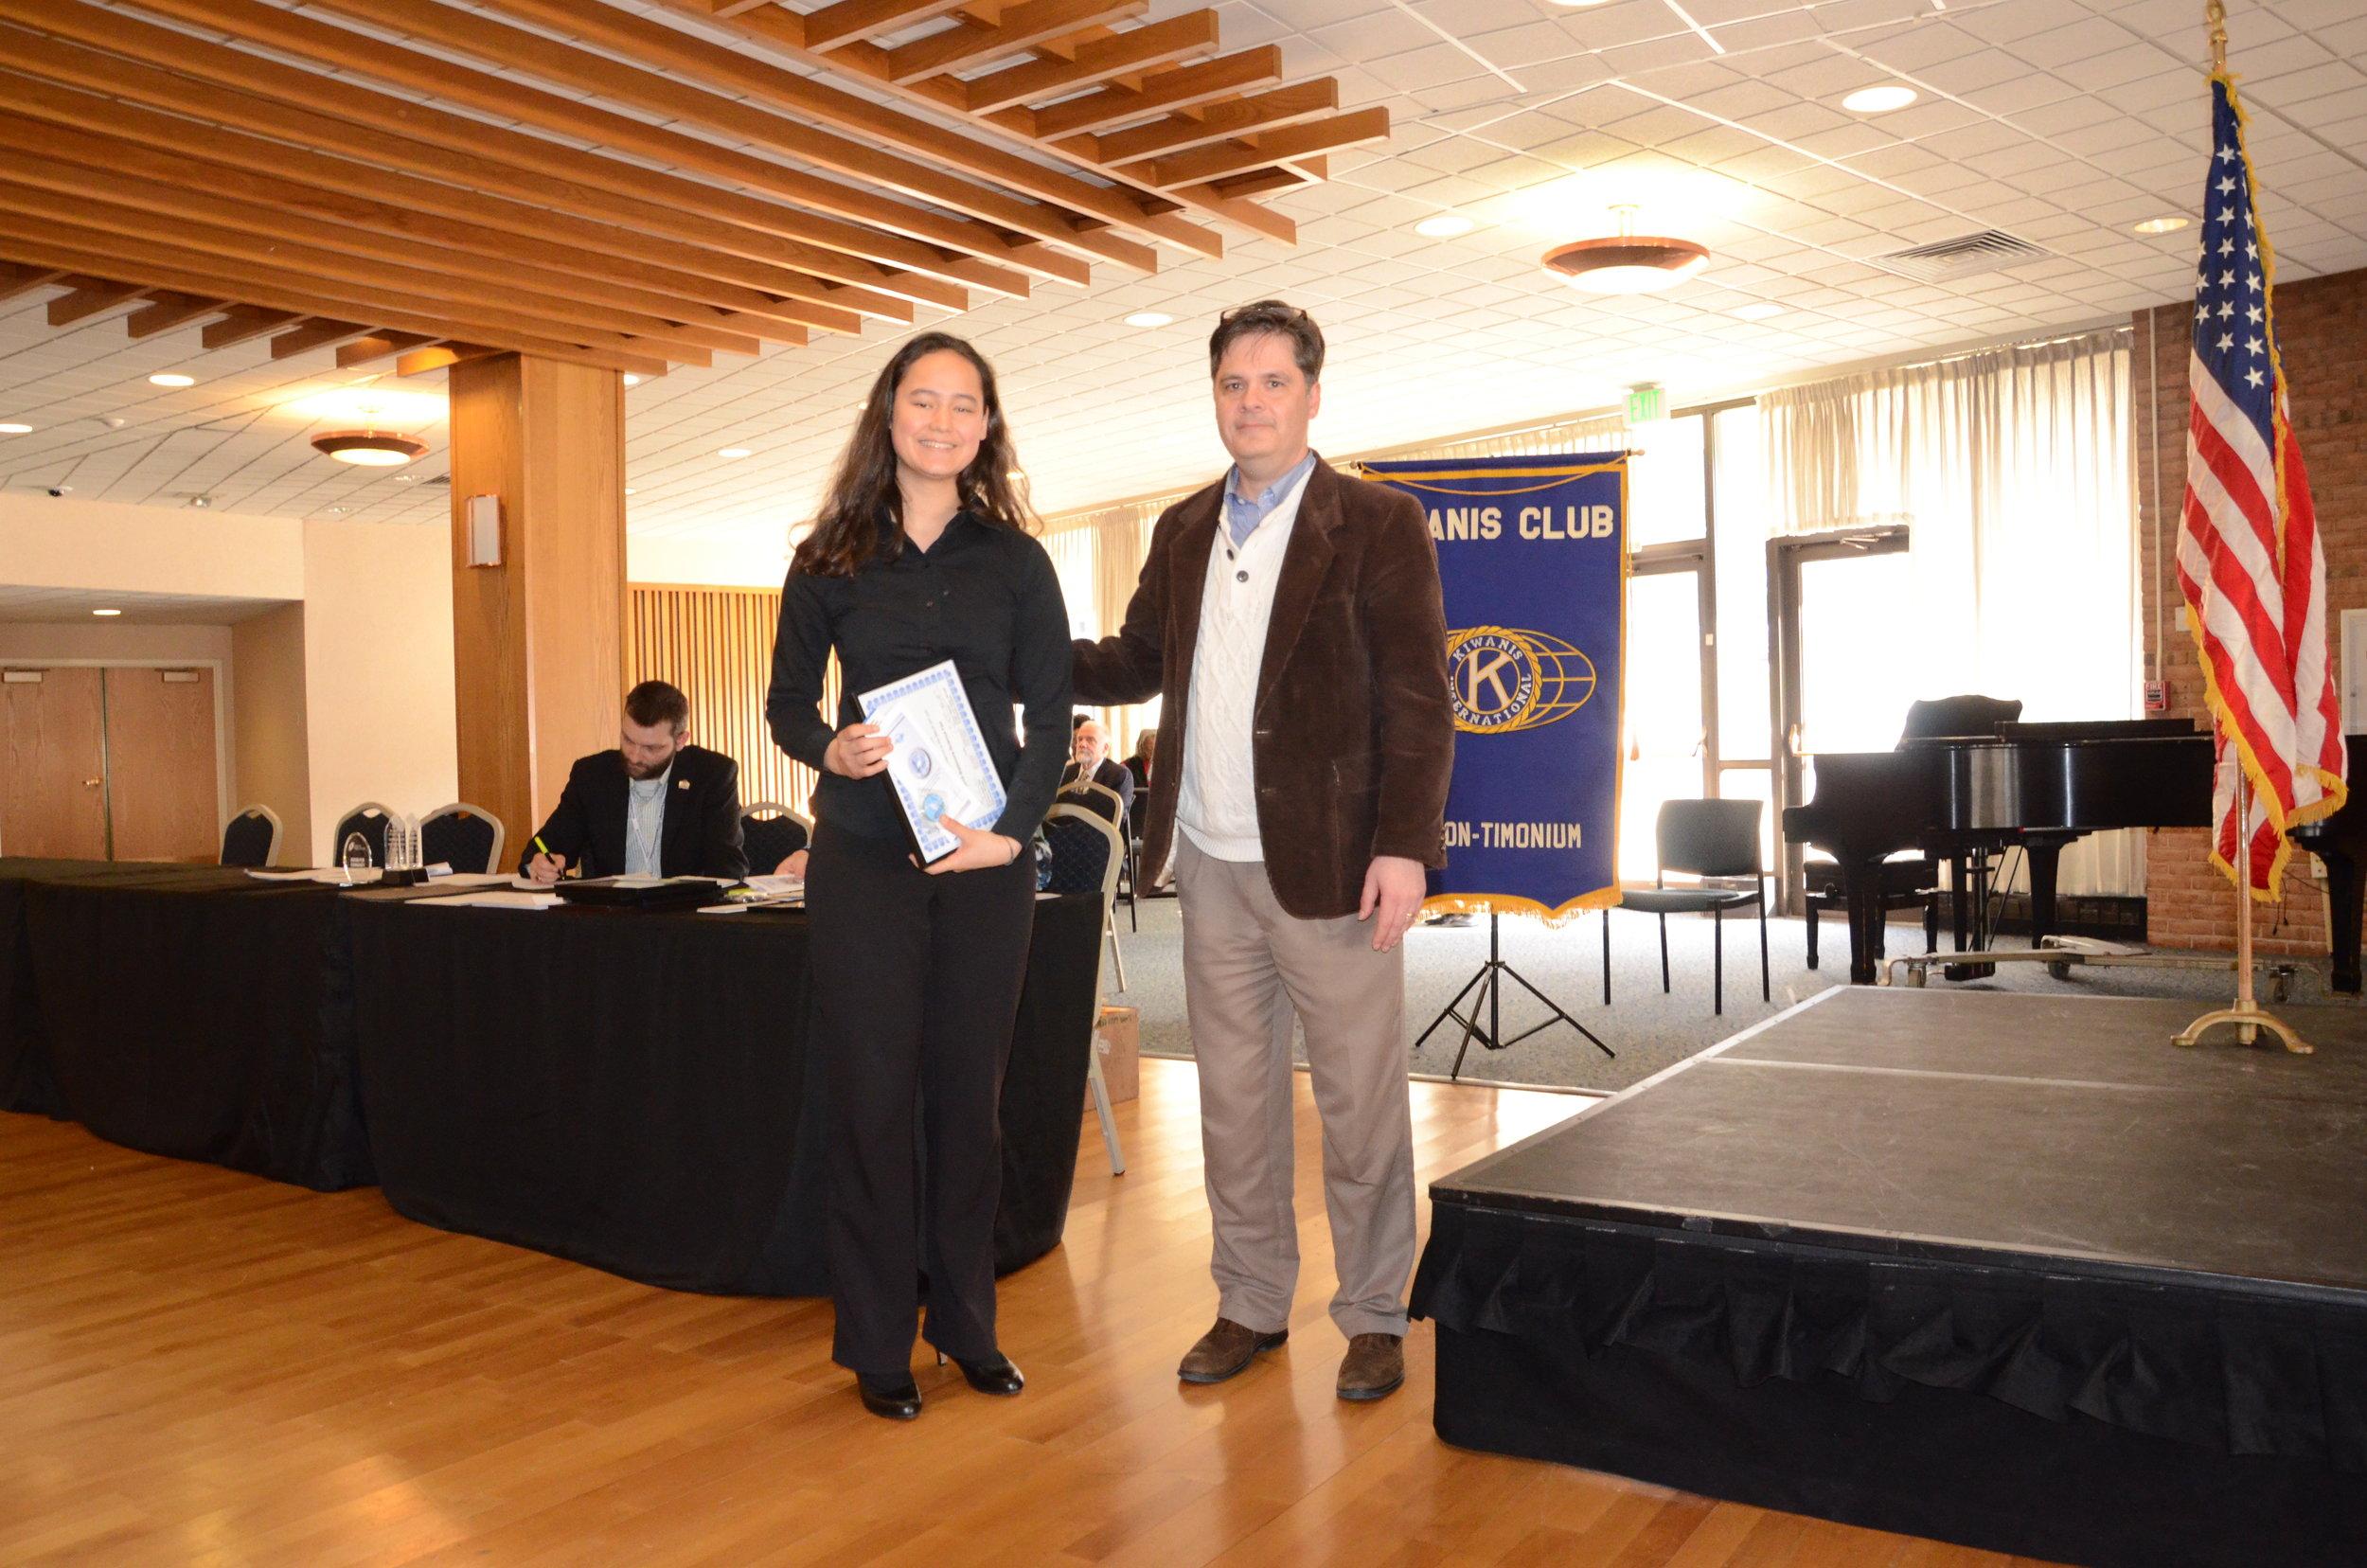 Honorary Award Nicole Meister Improving Robustness of X-ray Synchroton Image Analysis Using Deep Learning and Data Augmentation.